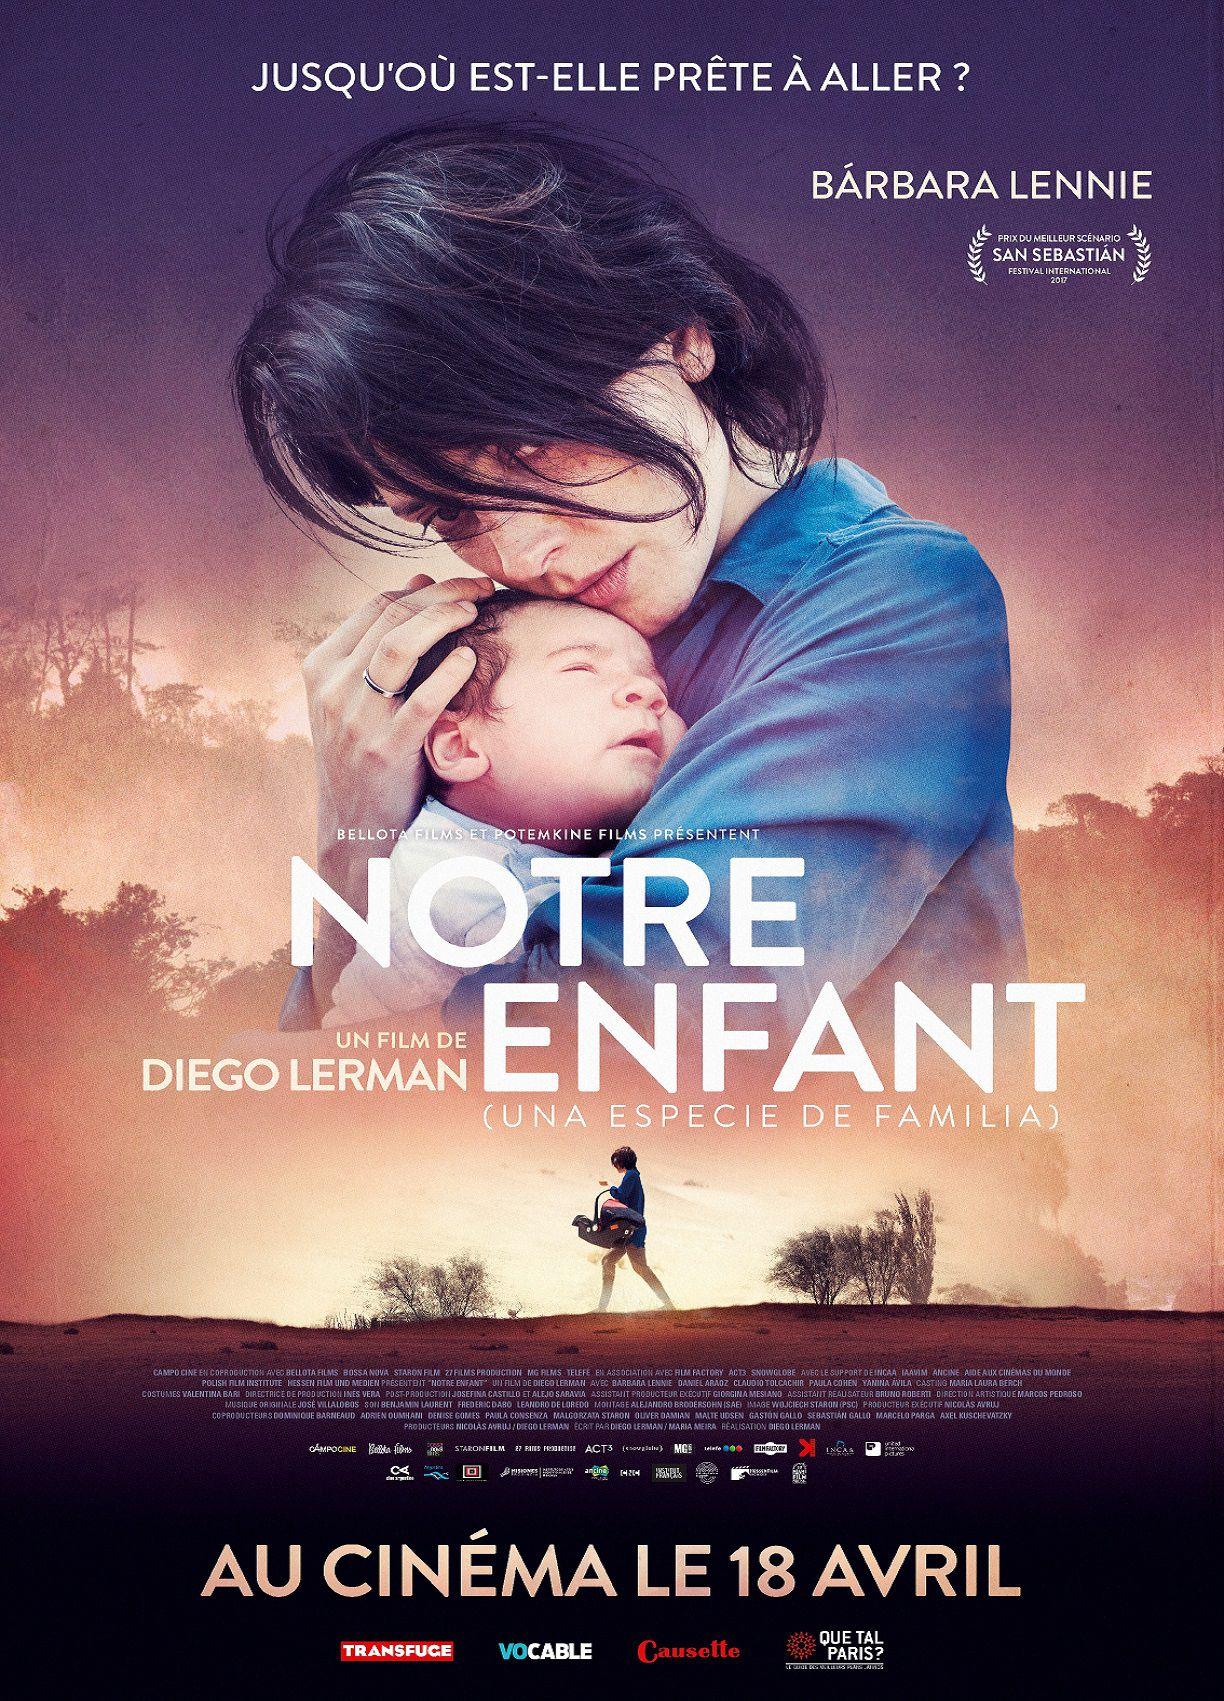 Notre enfant - Film (2018)